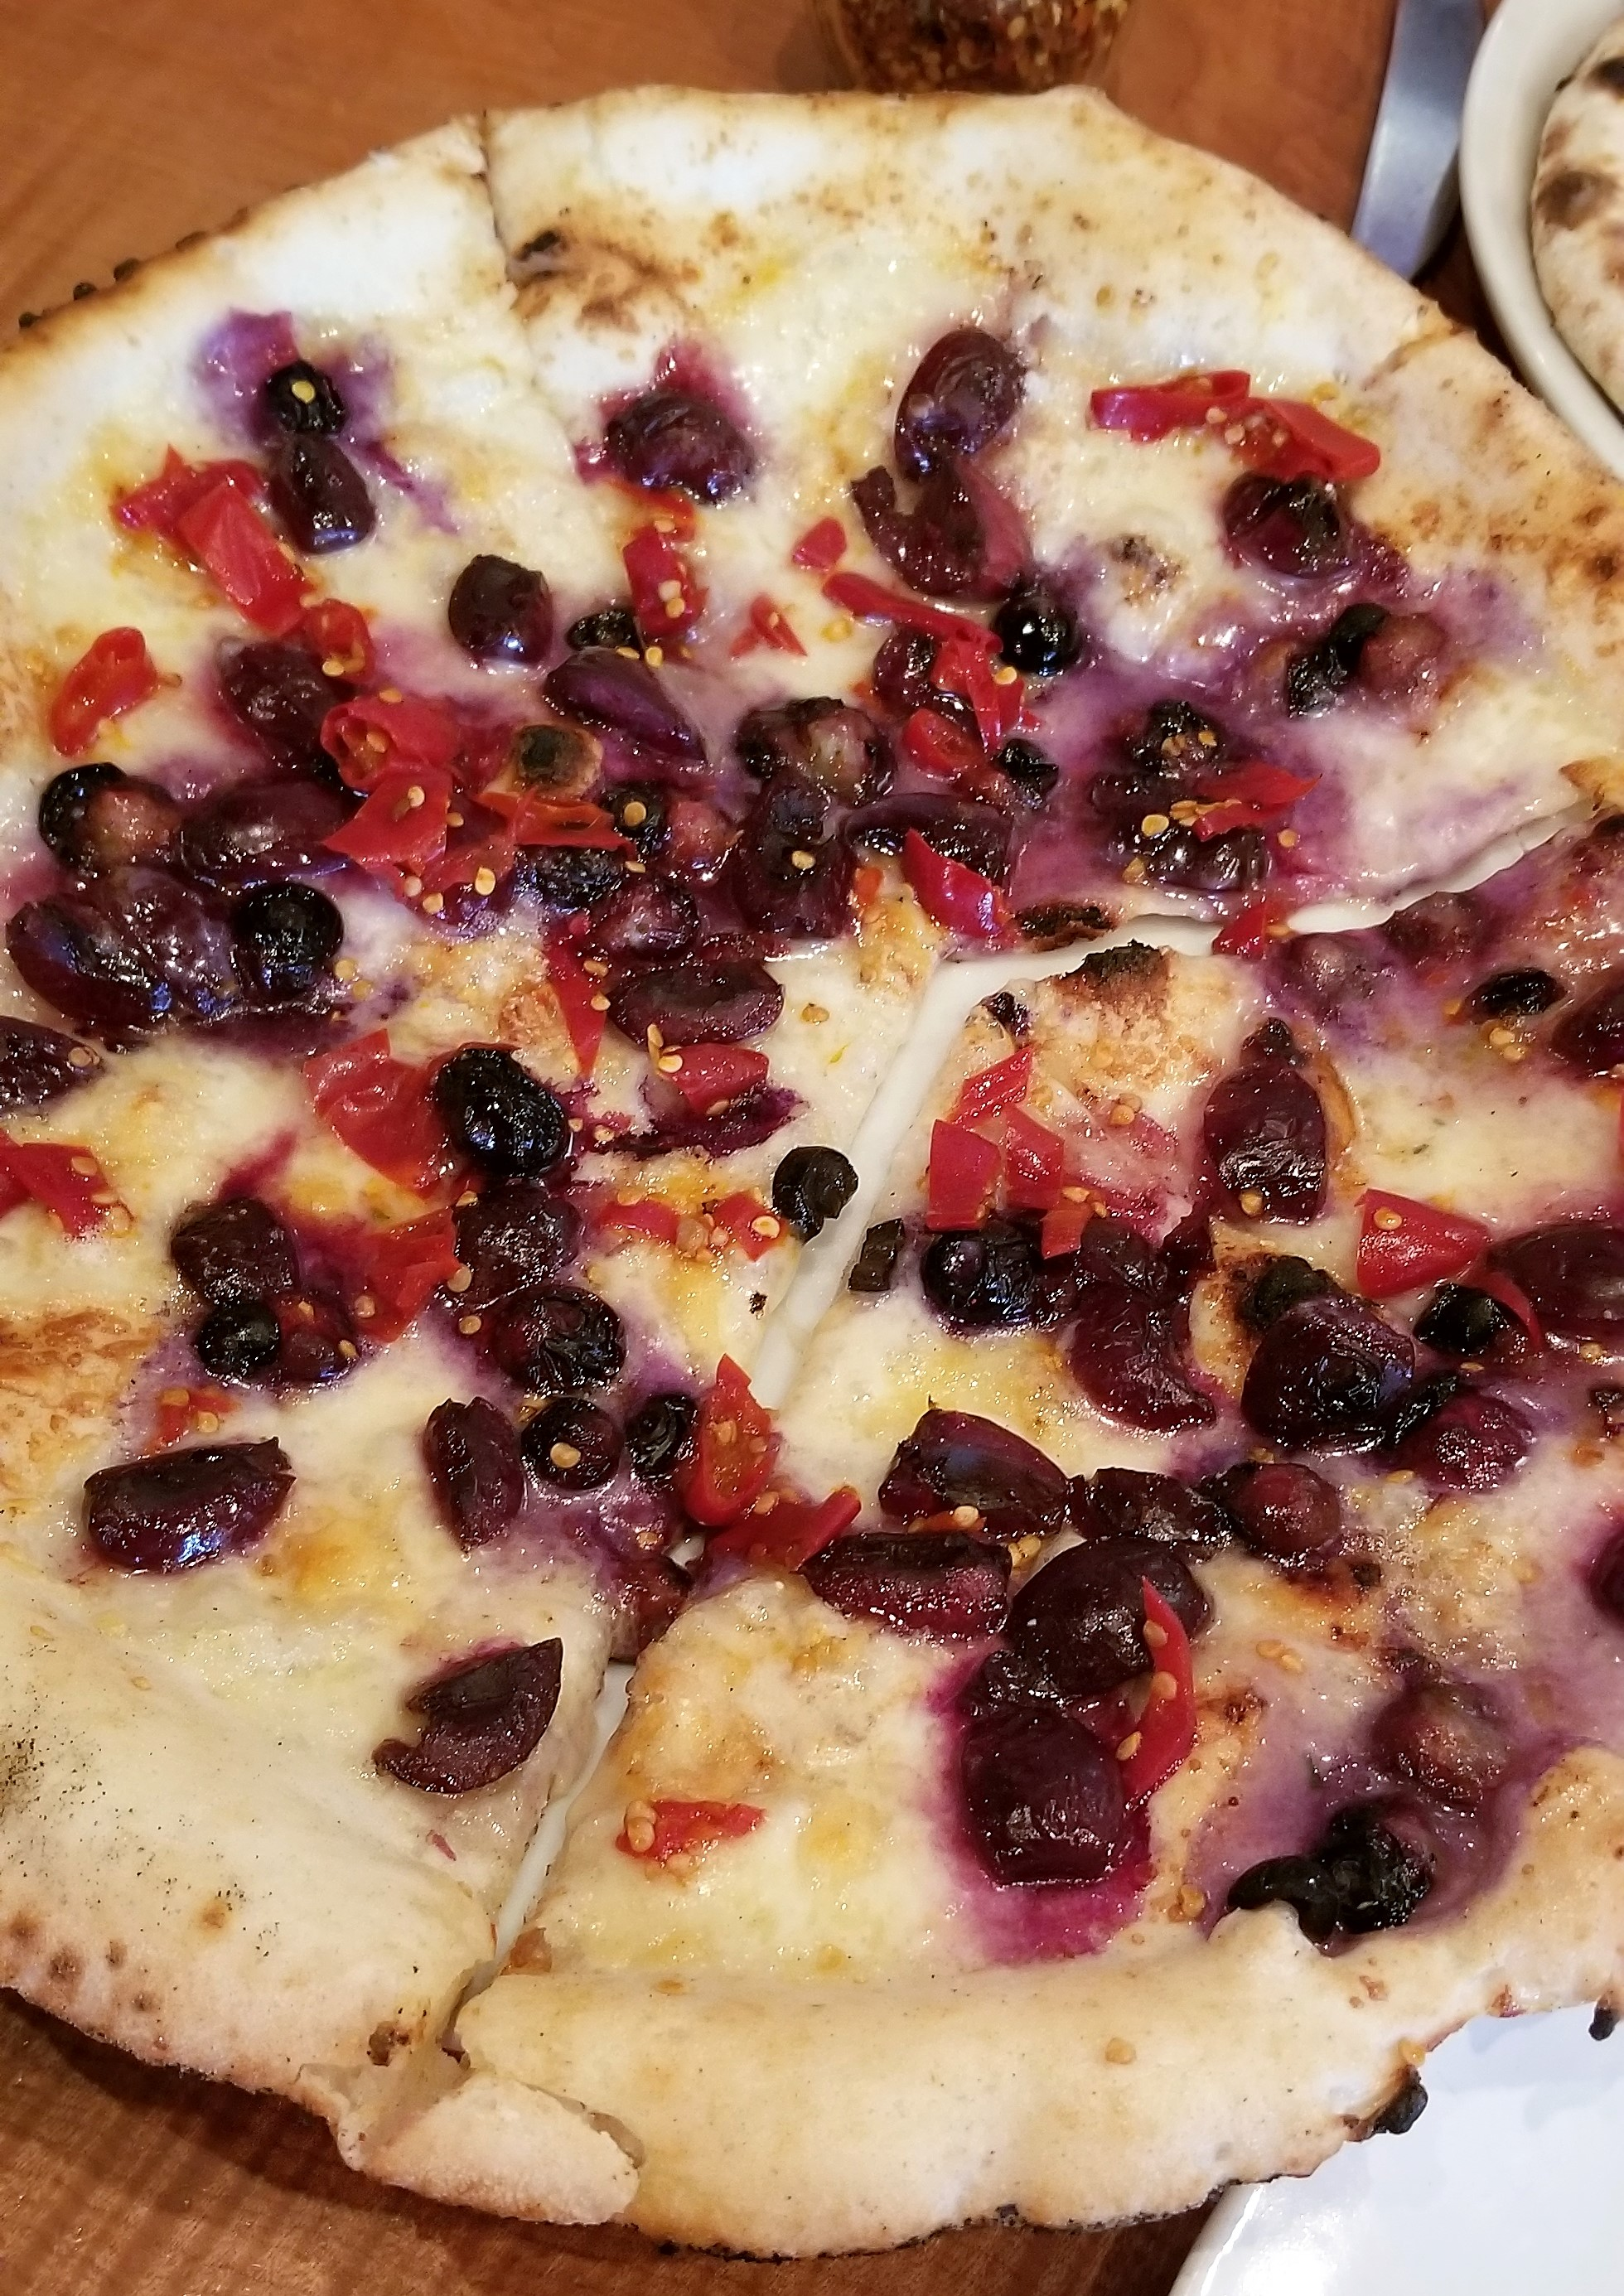 Seasonal pizza at Pizzeria Otto in Portland, blueberries, cherries, Calabrian chilis, tellegio cheese and gorgonzola!